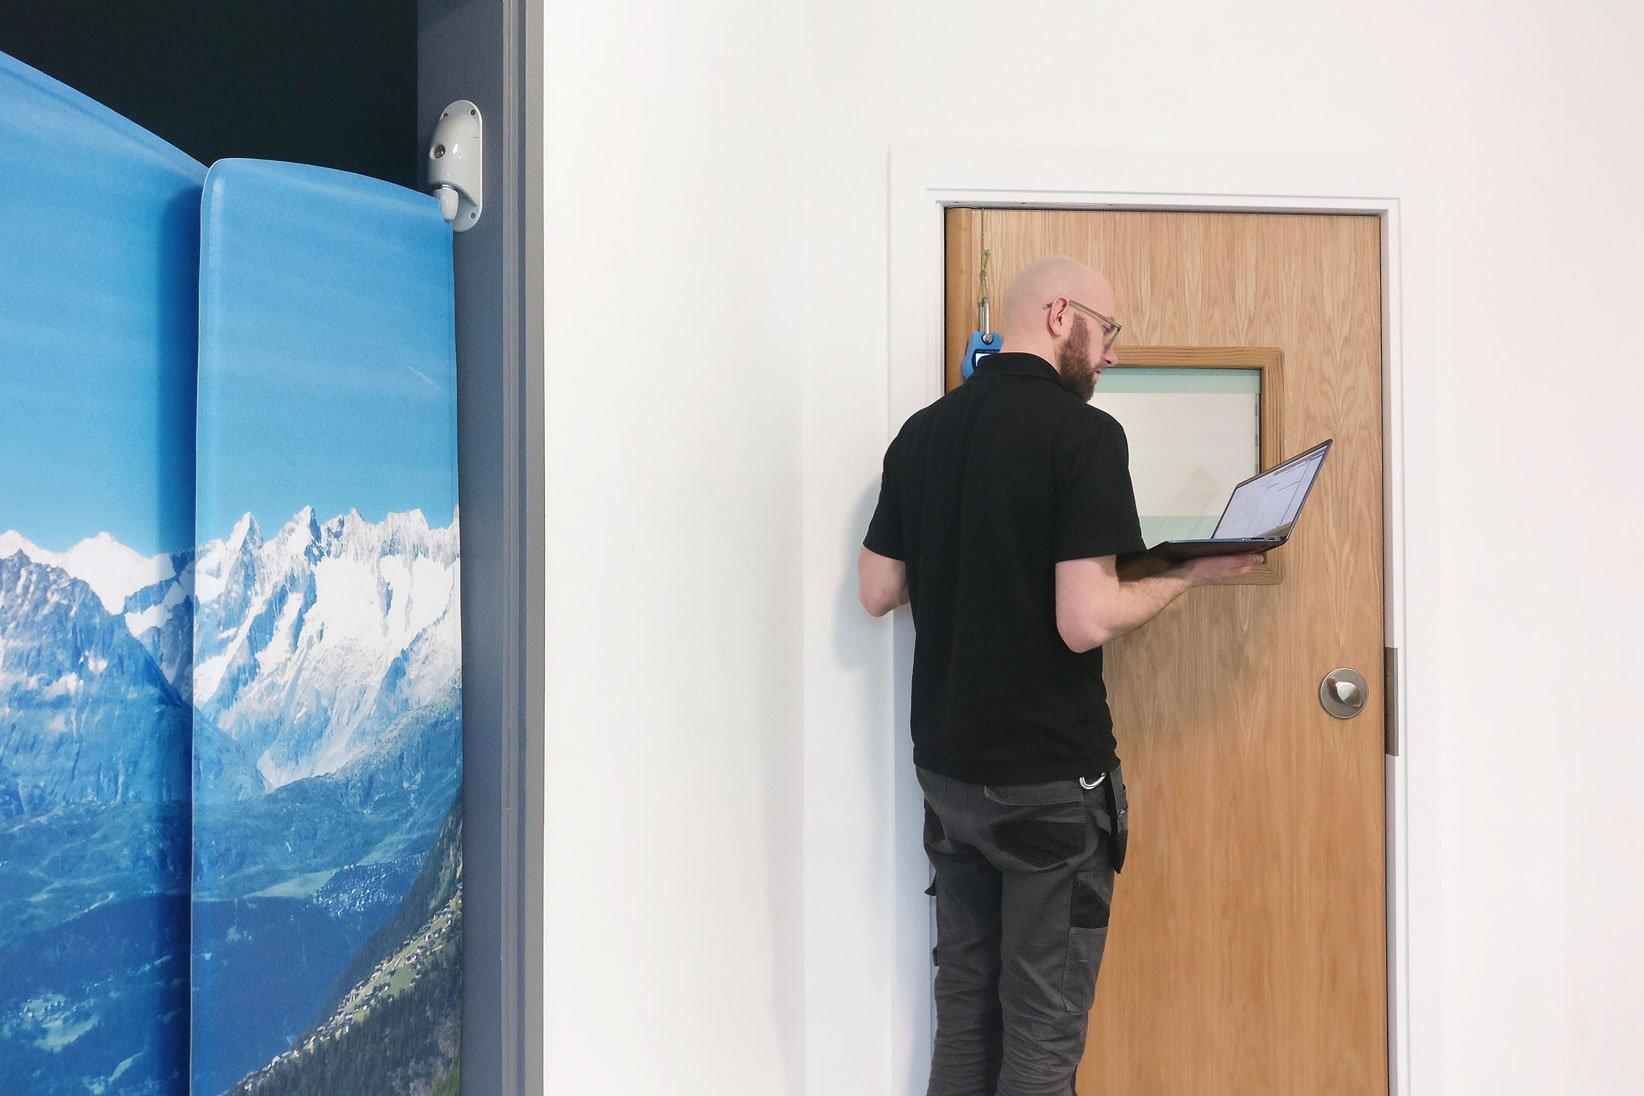 Full-door-ligtaure-alarm-testing